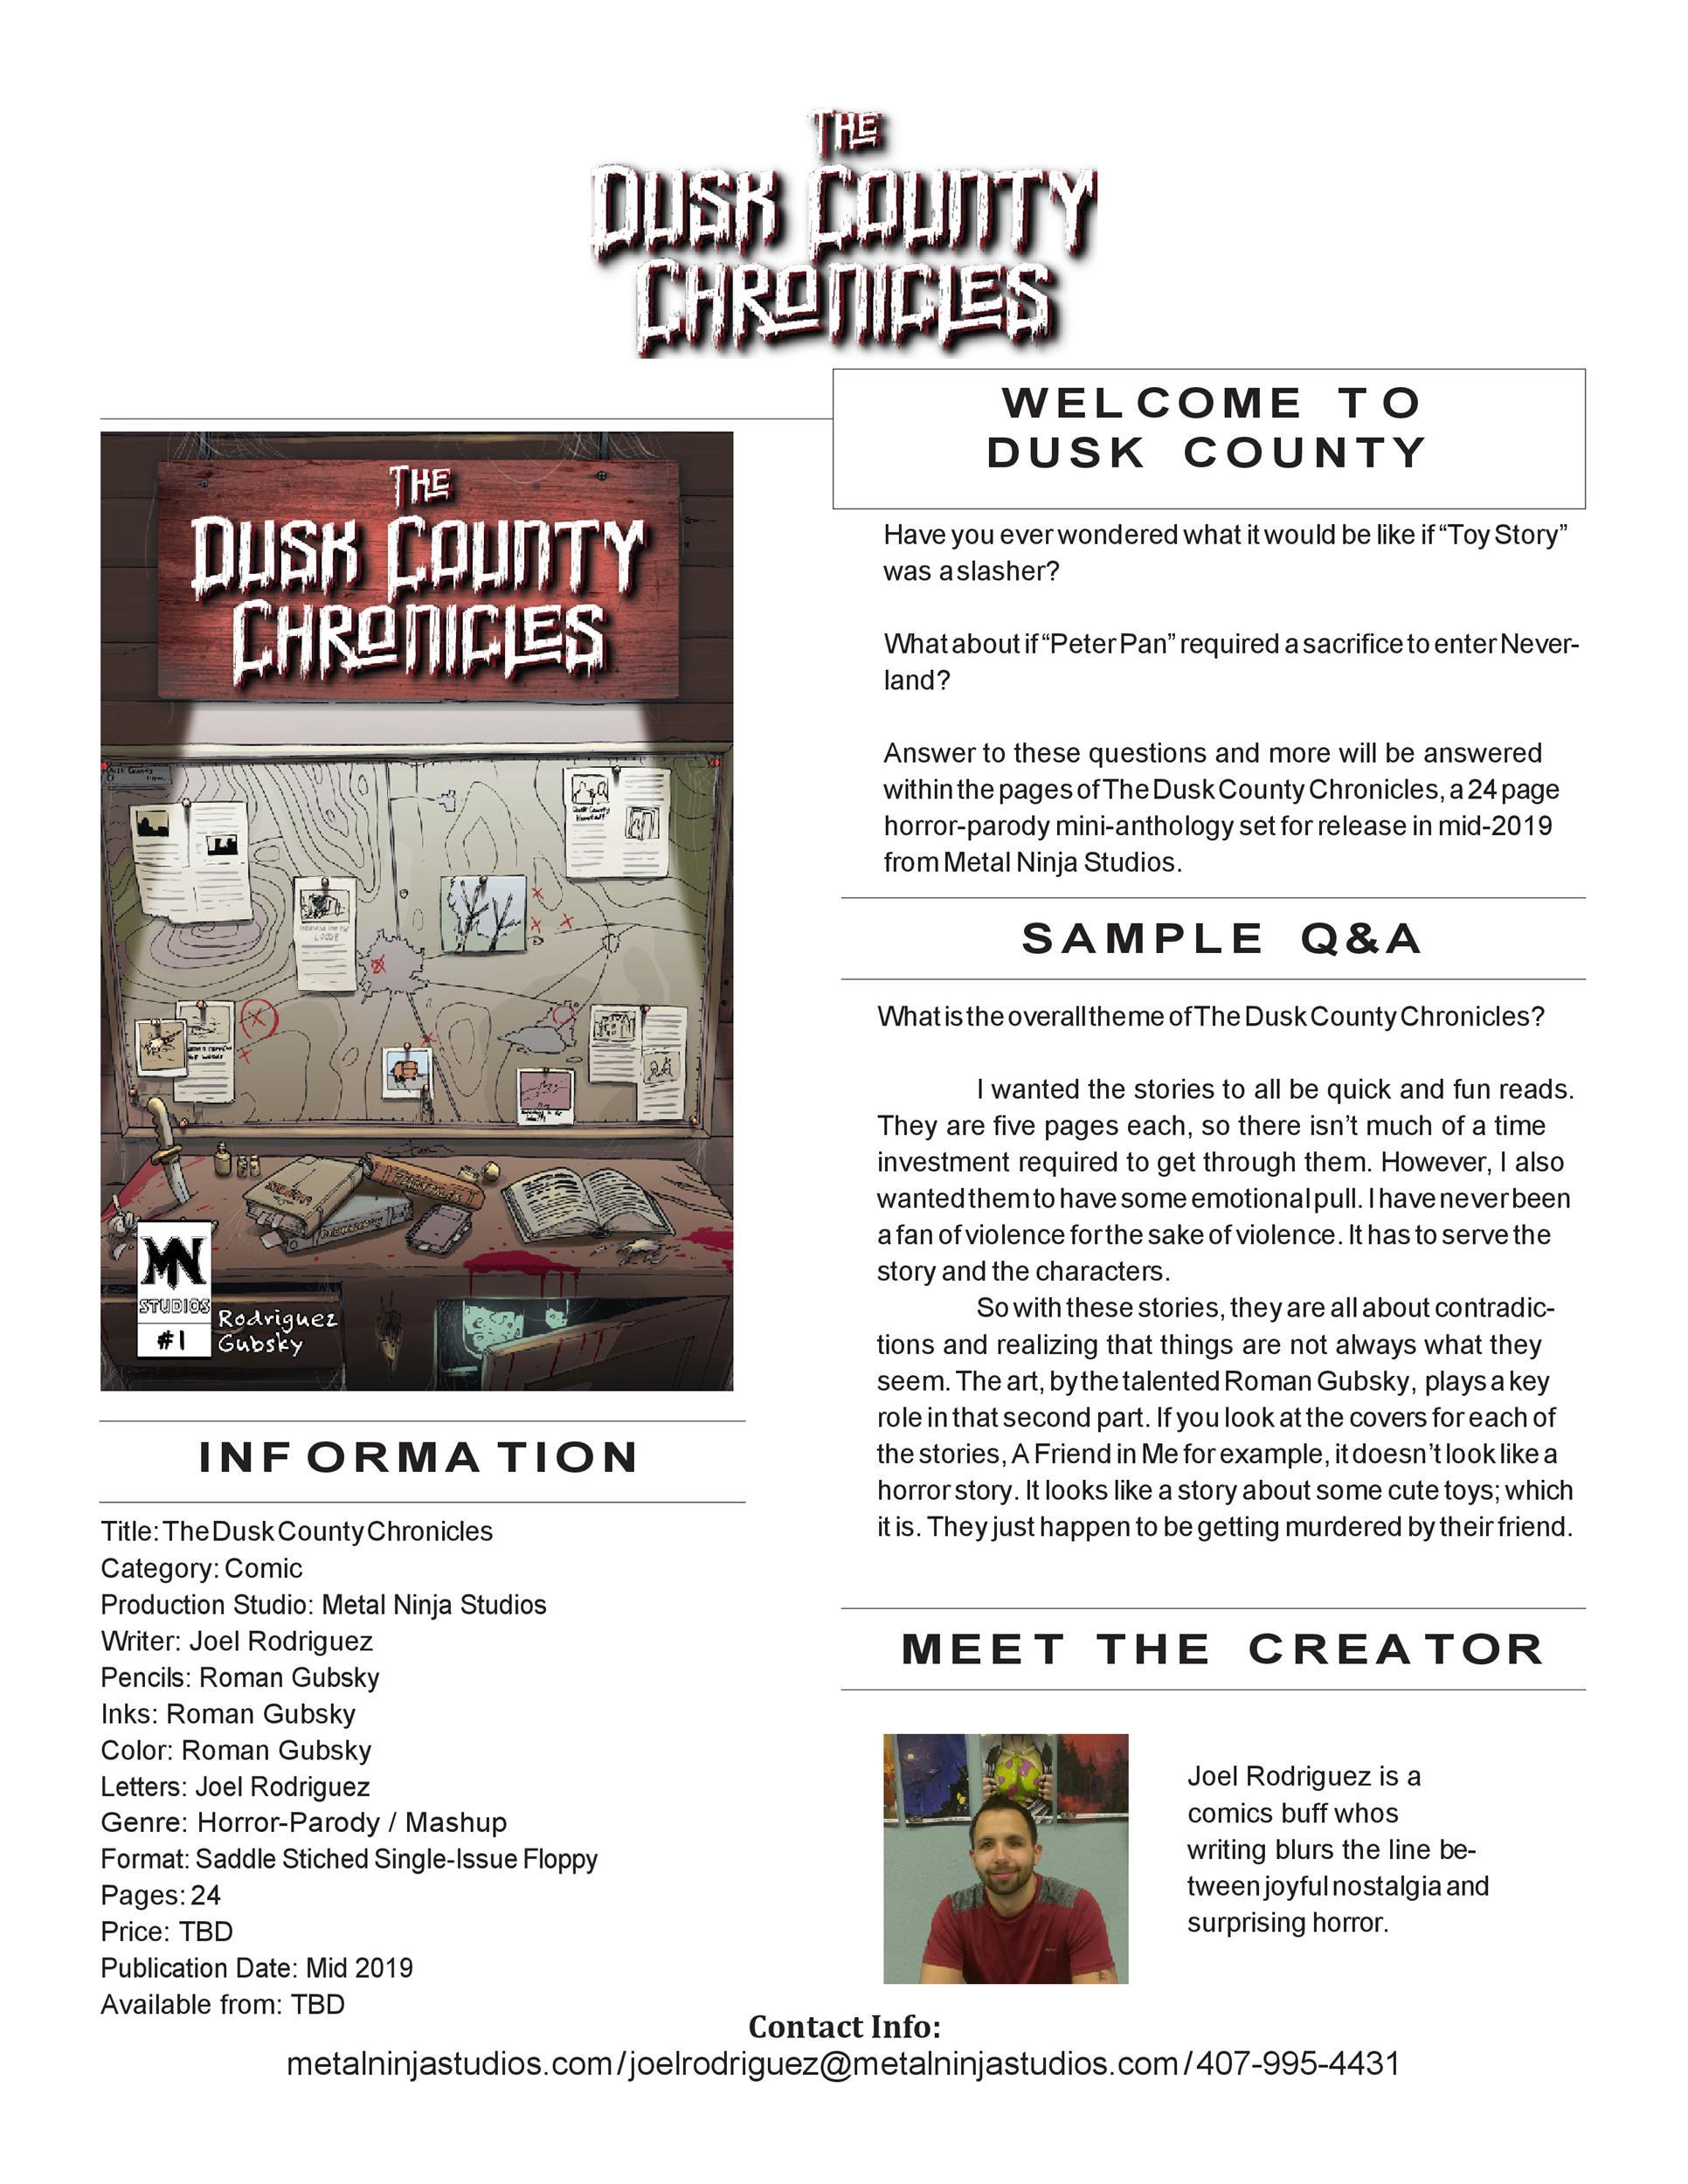 Free press kit template 11